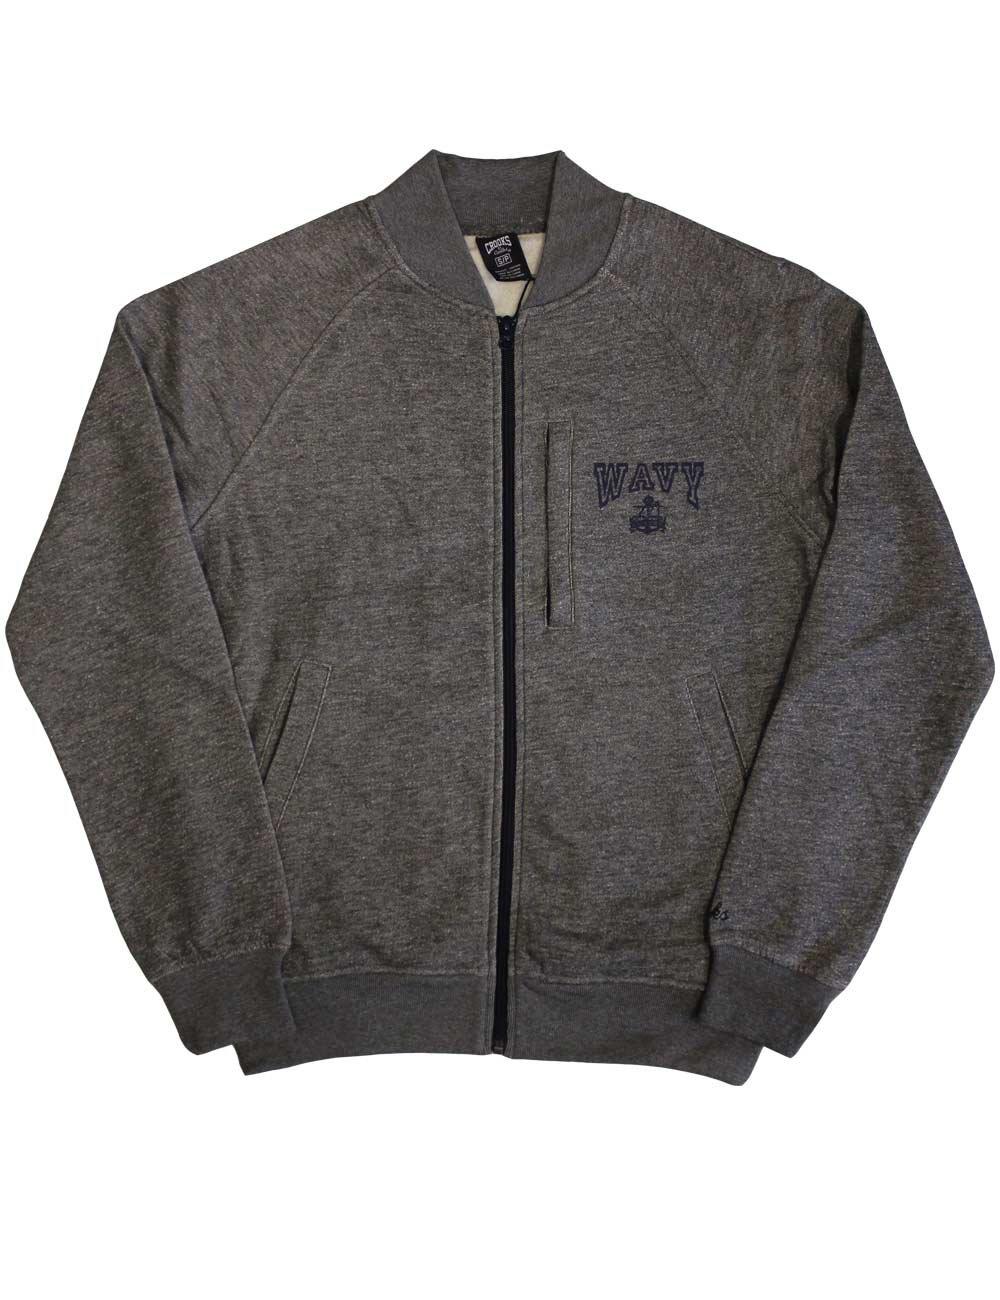 Crooks & Castles Wavy Zip Jacket Speckle Grey